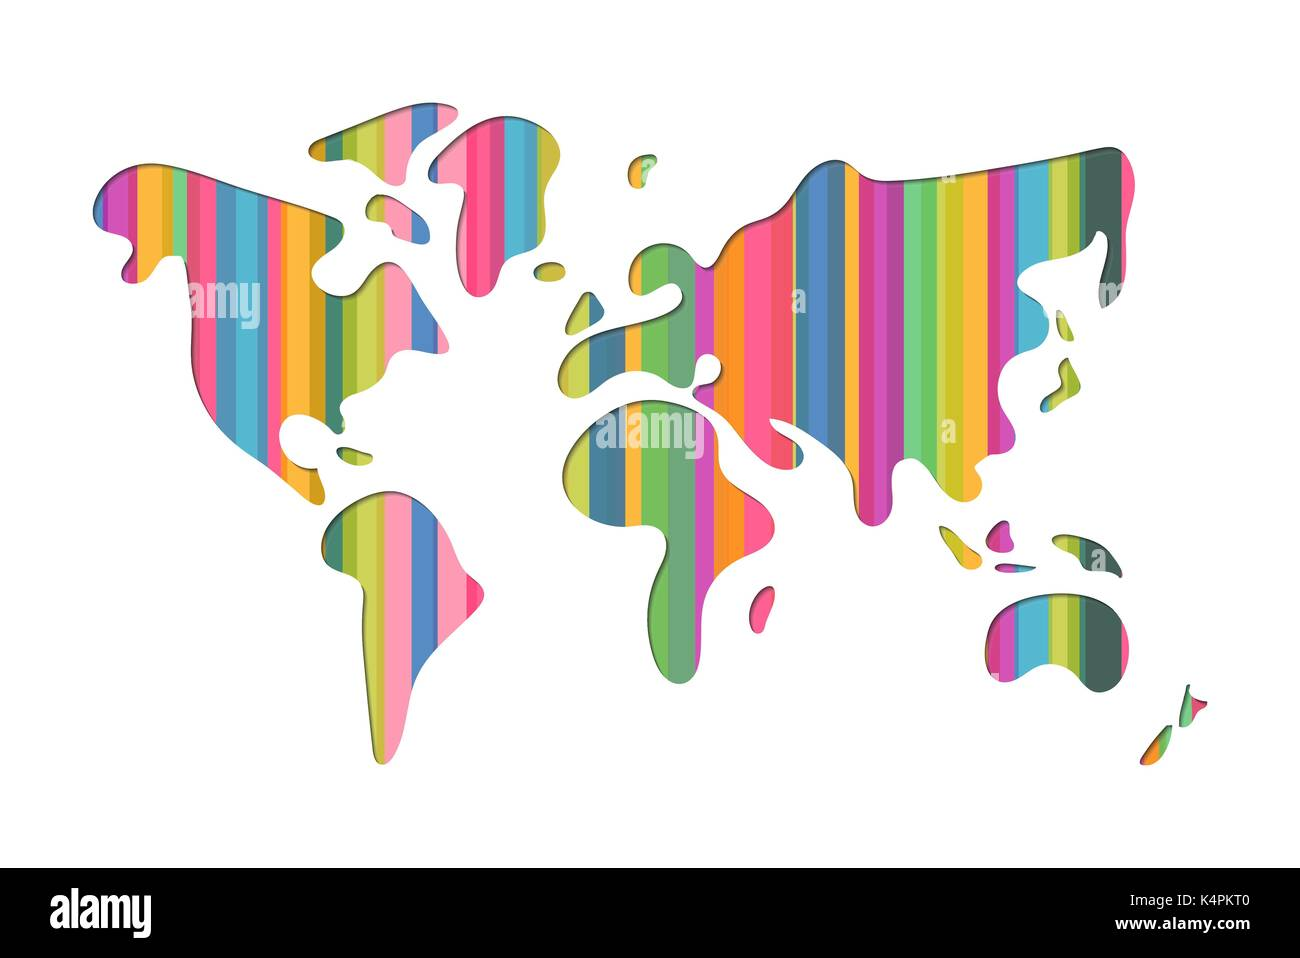 World map shape illustration in modern 3d paper cut art style stock world map shape illustration in modern 3d paper cut art style colorful realistic papercraft cutout design eps10 vector gumiabroncs Gallery